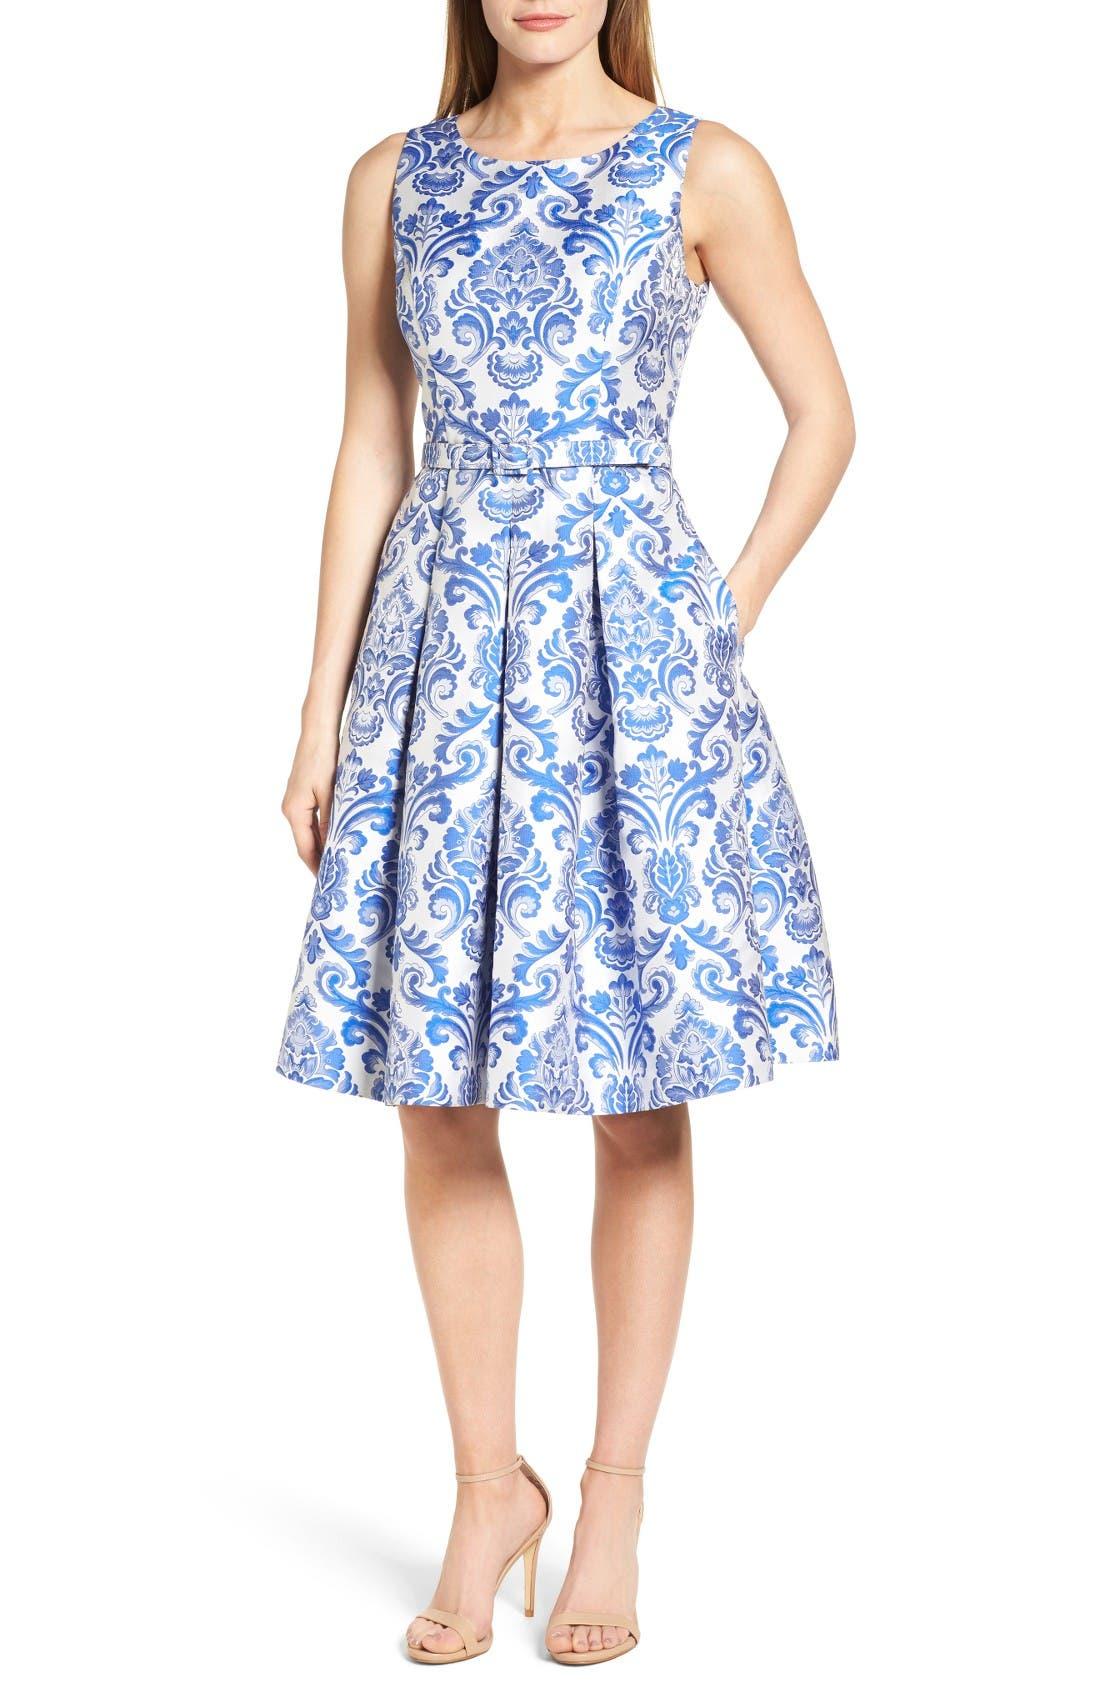 Alternate Image 1 Selected - Eliza J Jacquard Fit & Flare Dress (Regular & Petite)